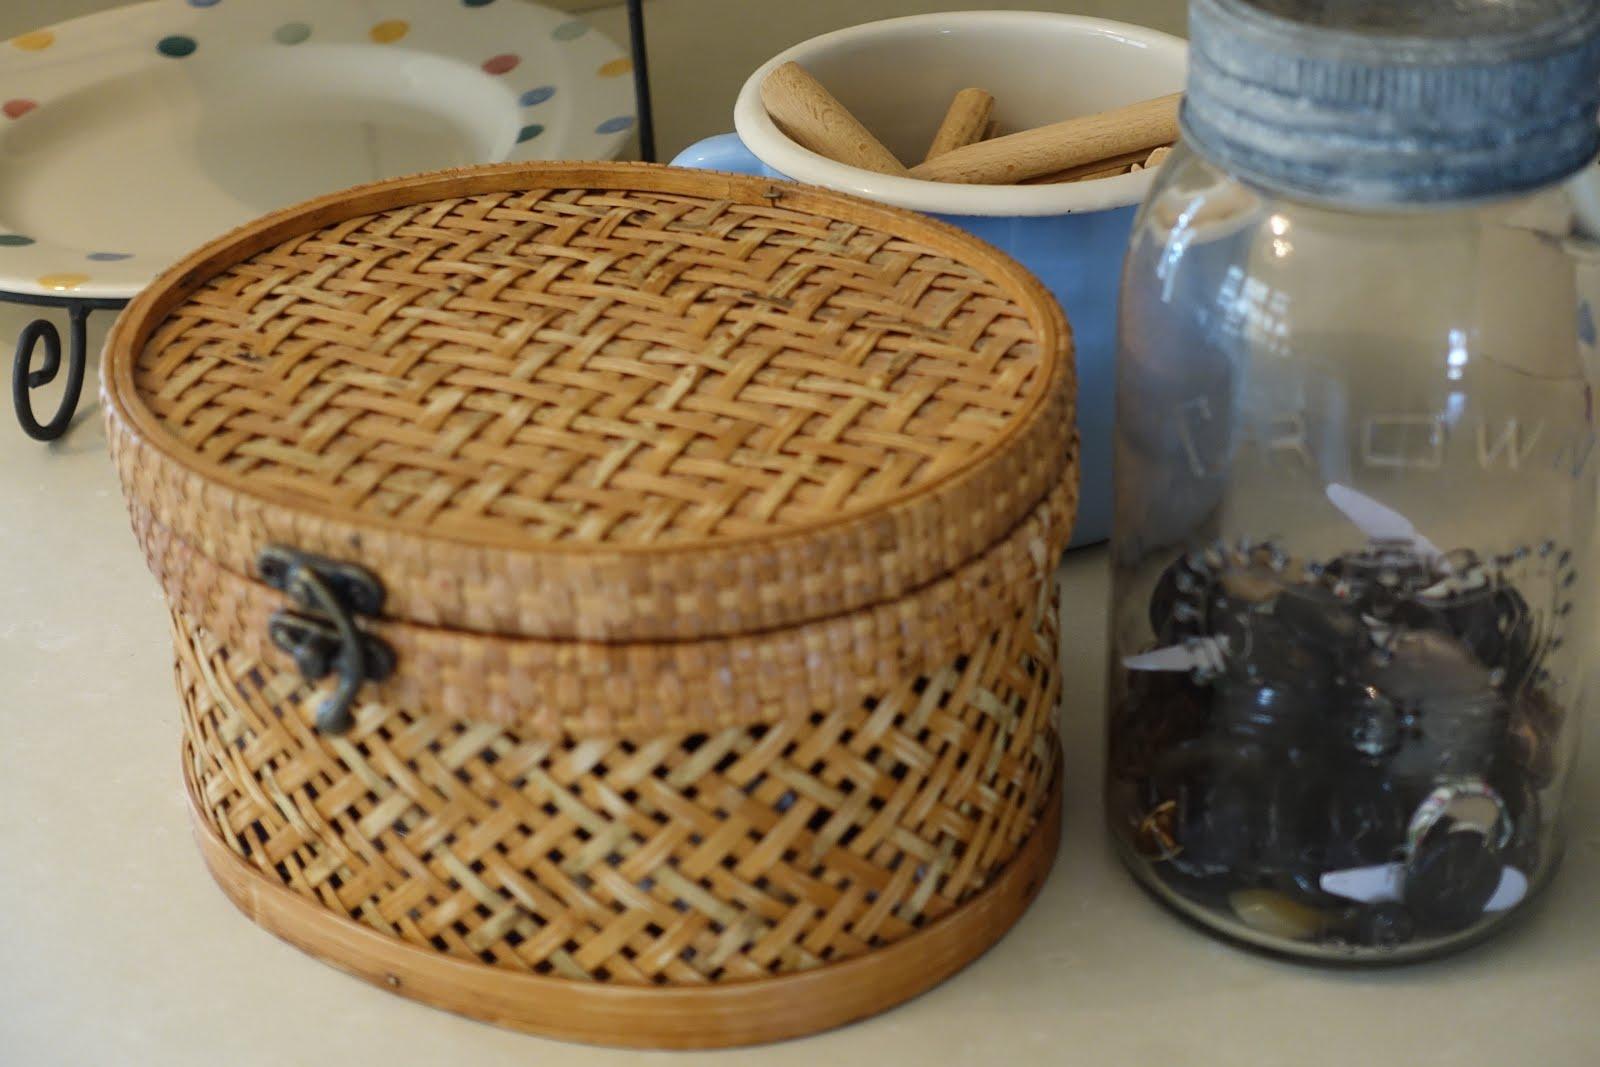 Mending Baskets